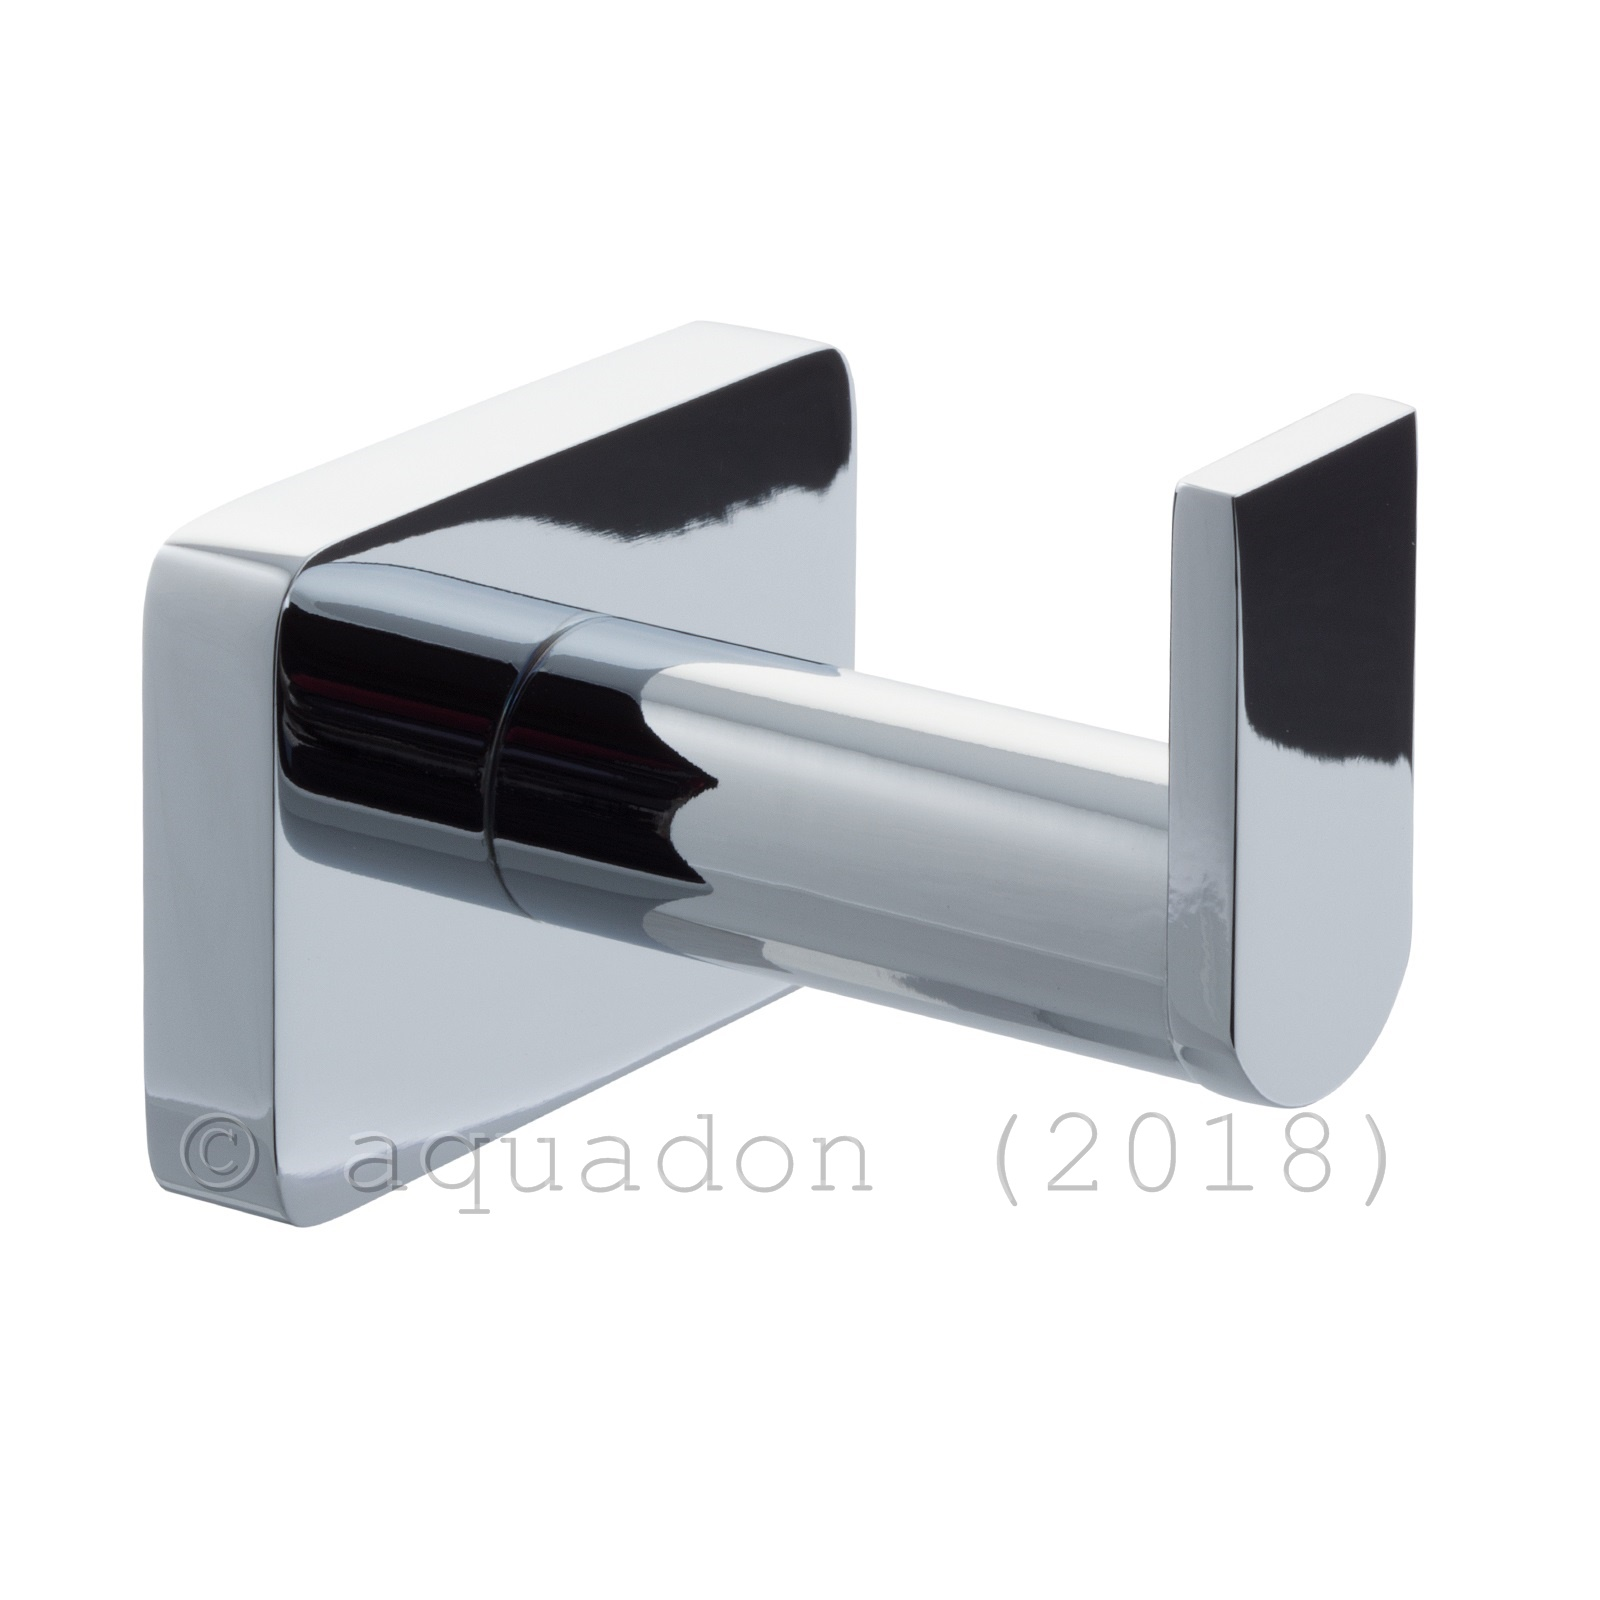 Poppy Modern Bathroom Wall Accessories Set Polished Chrome | eBay